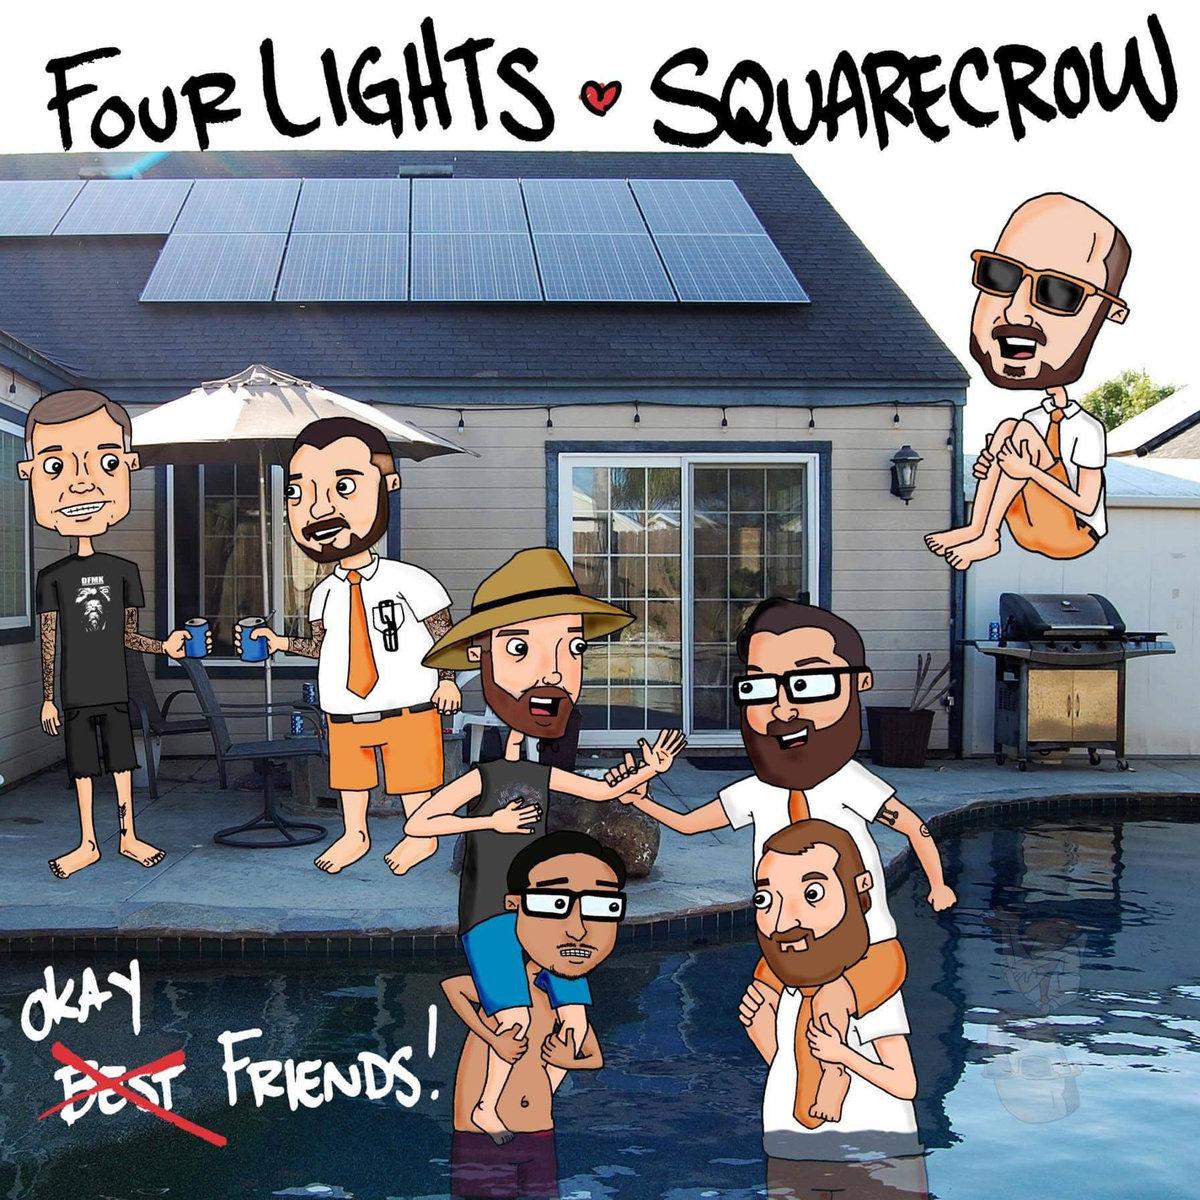 Four Lights / Squarecrow - Okay Friends Split